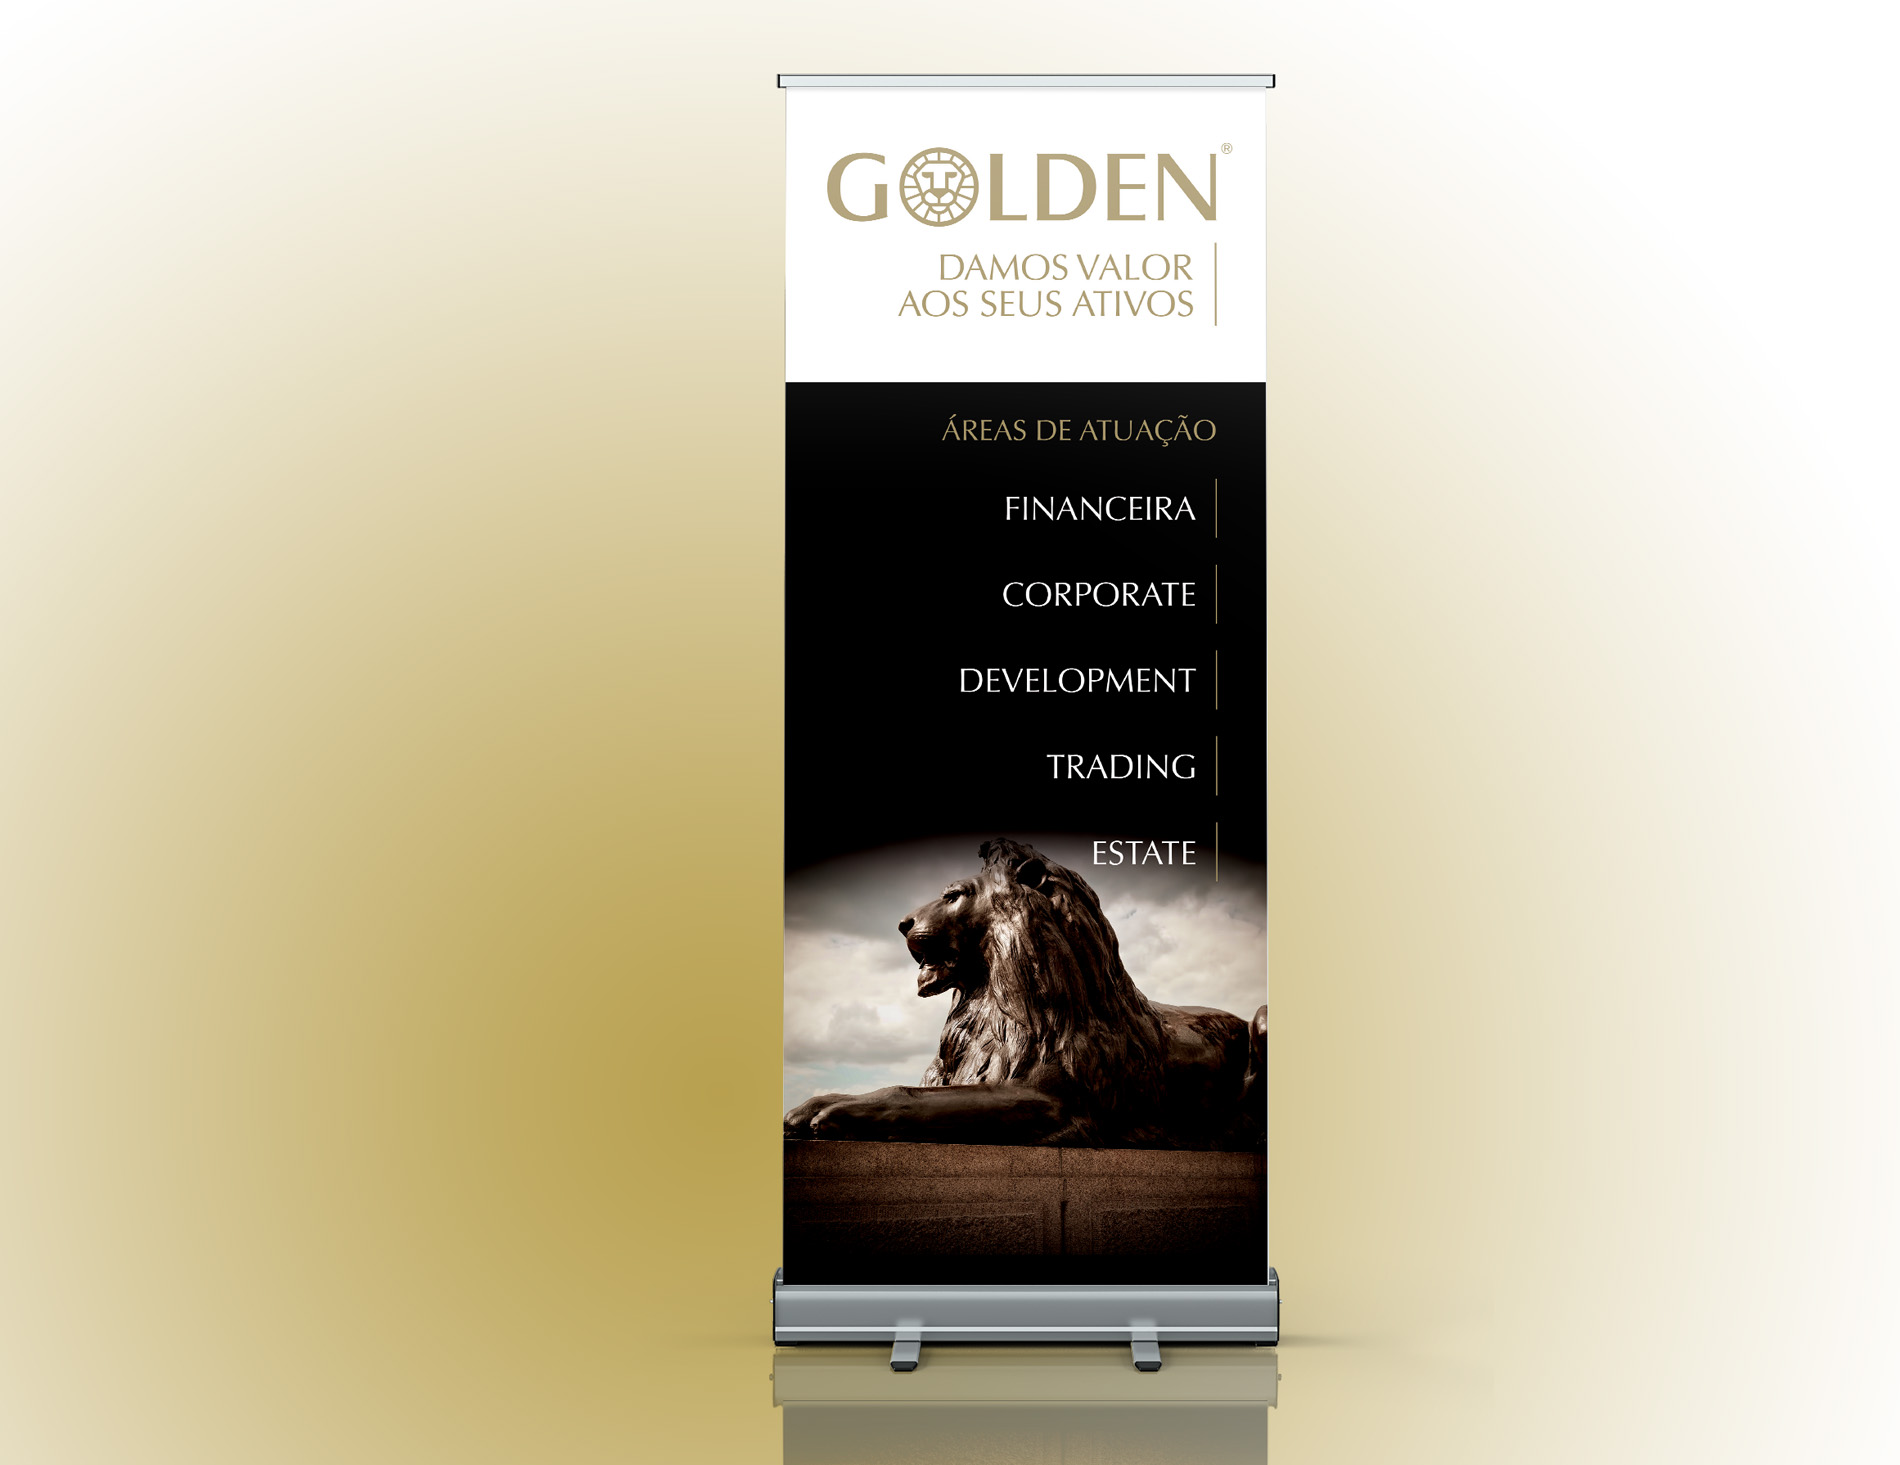 golden_identidade